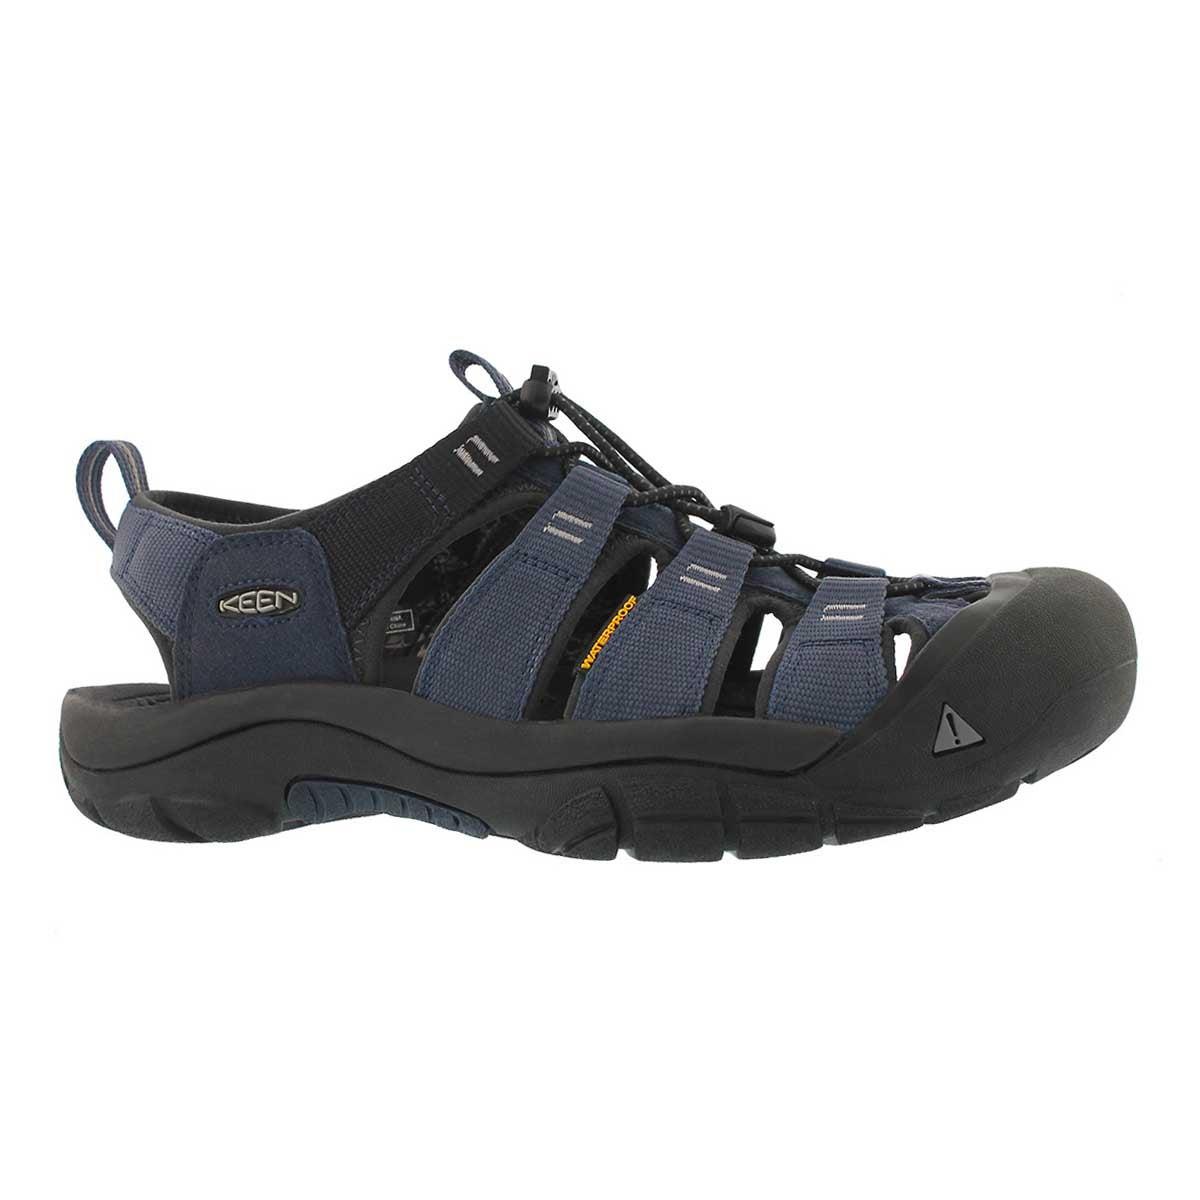 Men's NEWPORT HYDRO blue/grey sport sandals